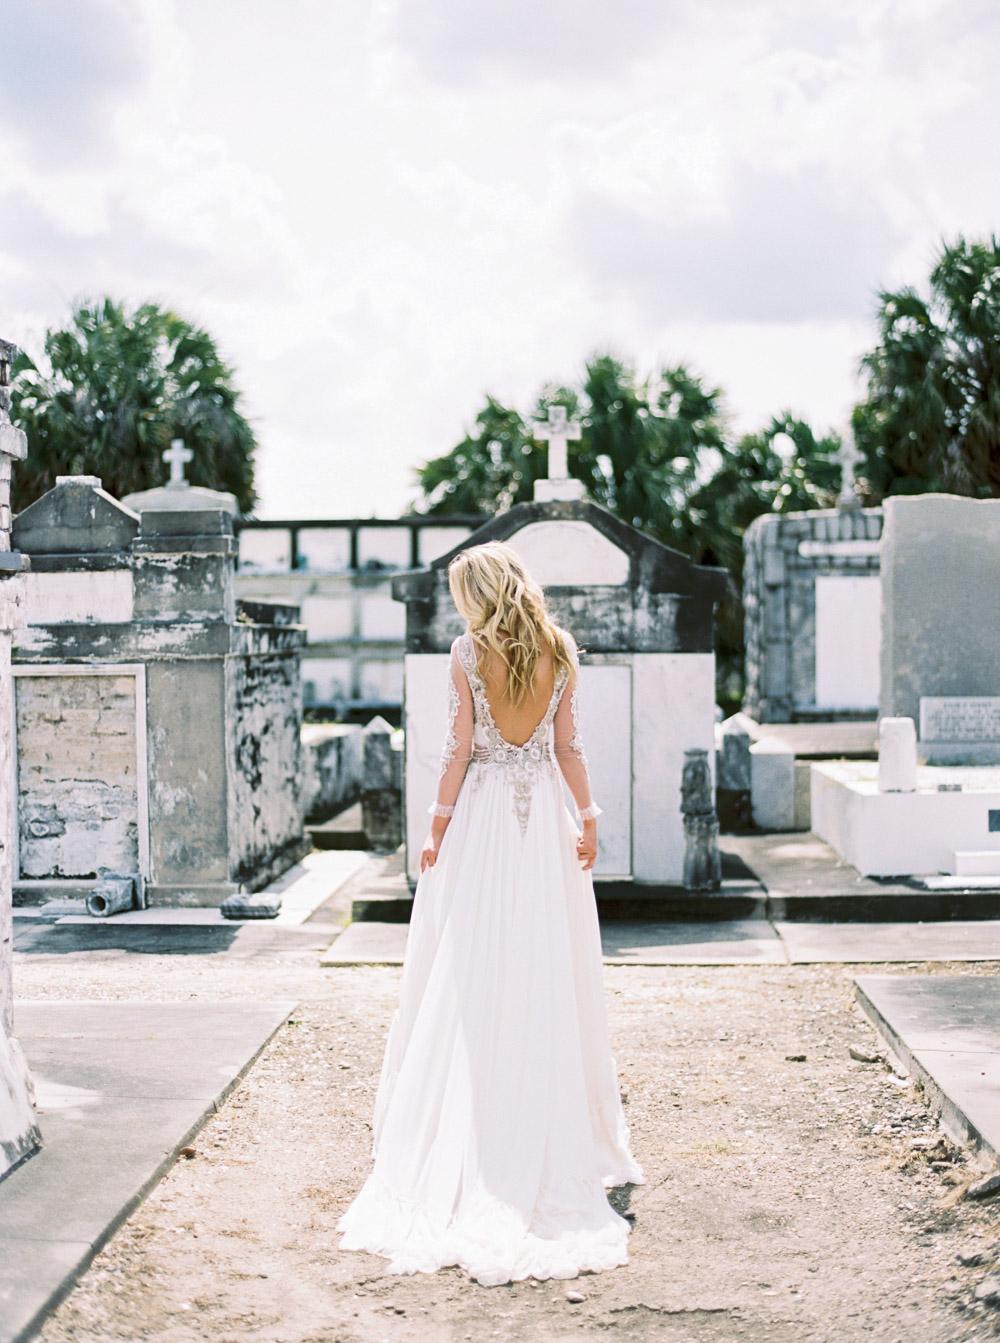 Katie Grant Photography (38 of 45).jpg